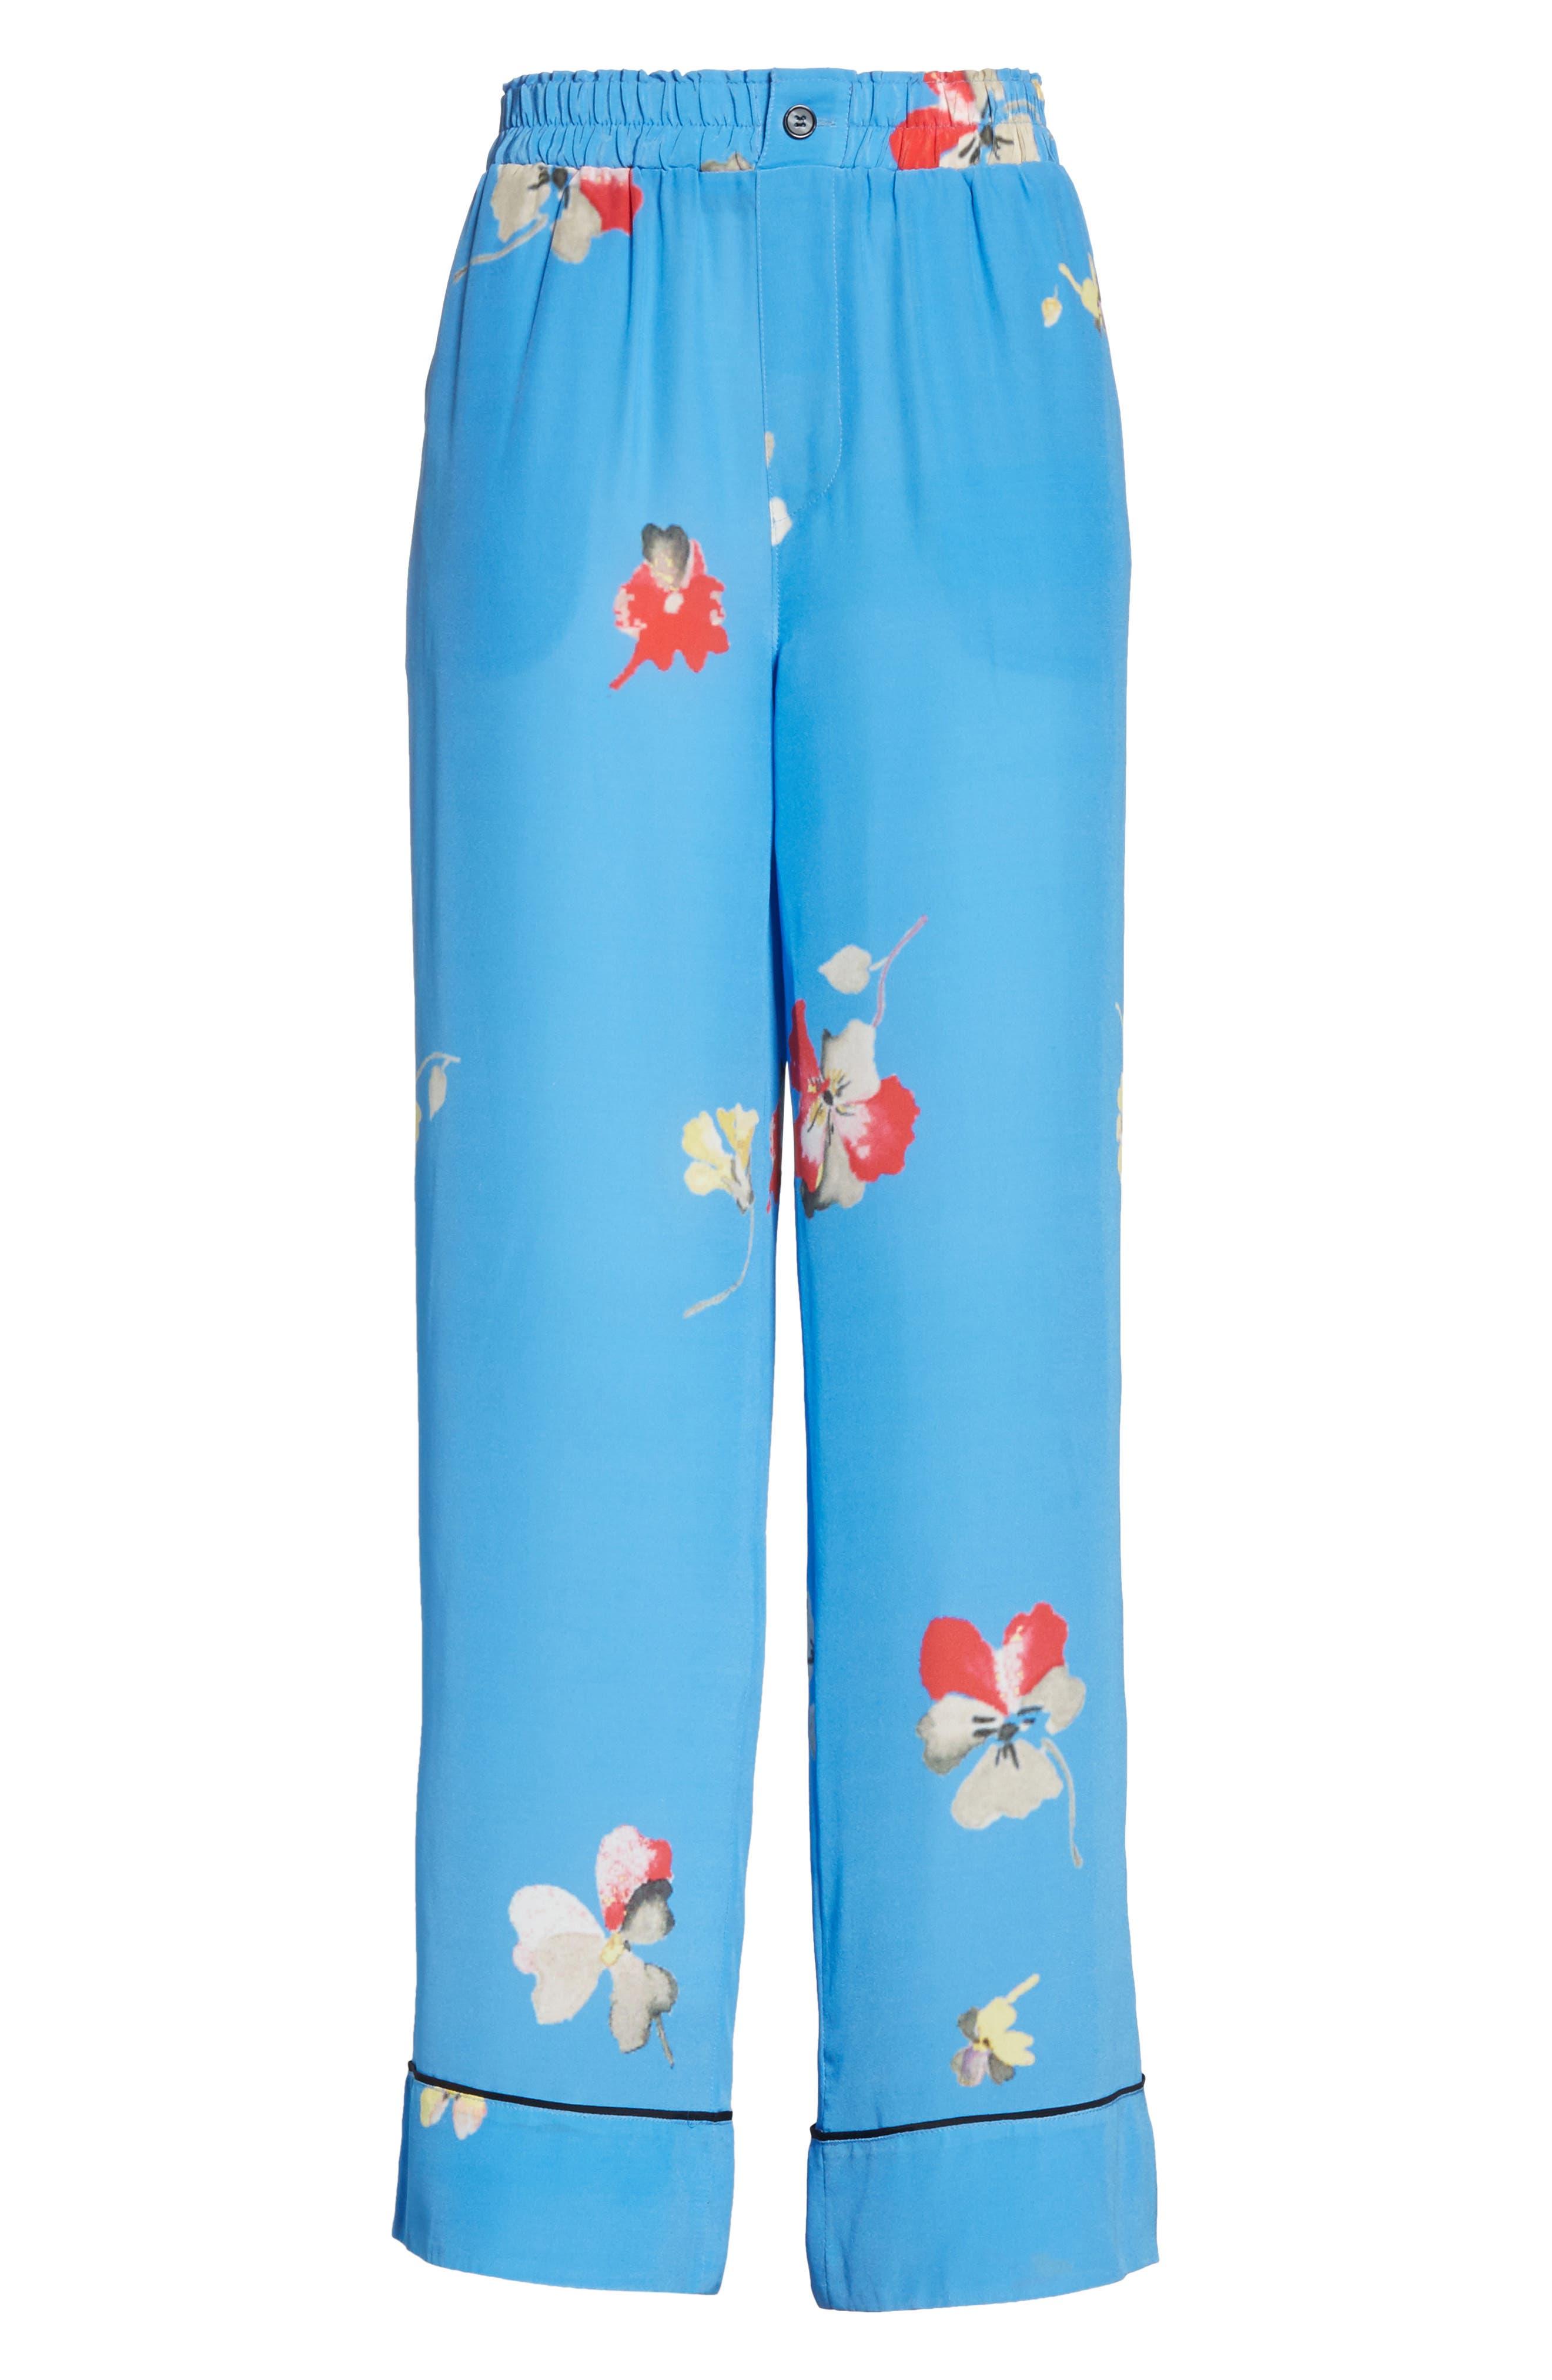 Joycedale Floral Silk Lounge Pants,                             Alternate thumbnail 6, color,                             Marina